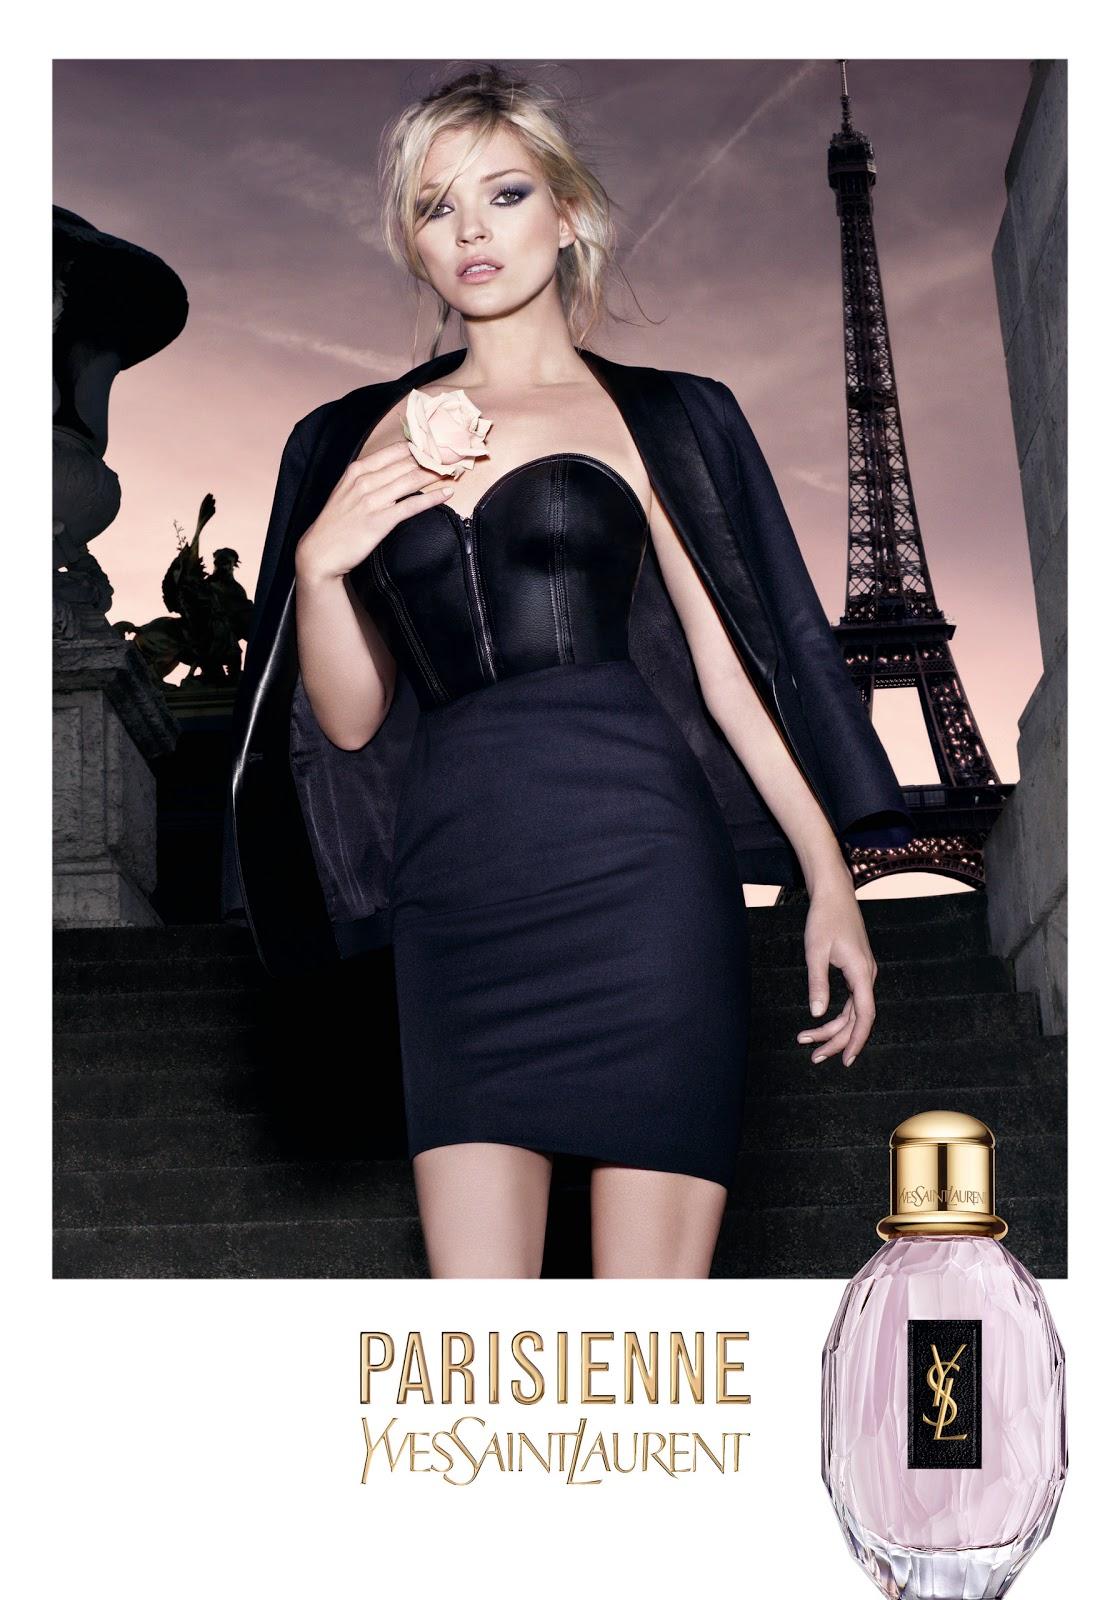 http://2.bp.blogspot.com/-zkeej8gwMuw/T3sb9nBsckI/AAAAAAAAEaE/6aB680AsGHY/s1600/Parisienne+Kate+Moss.jpg